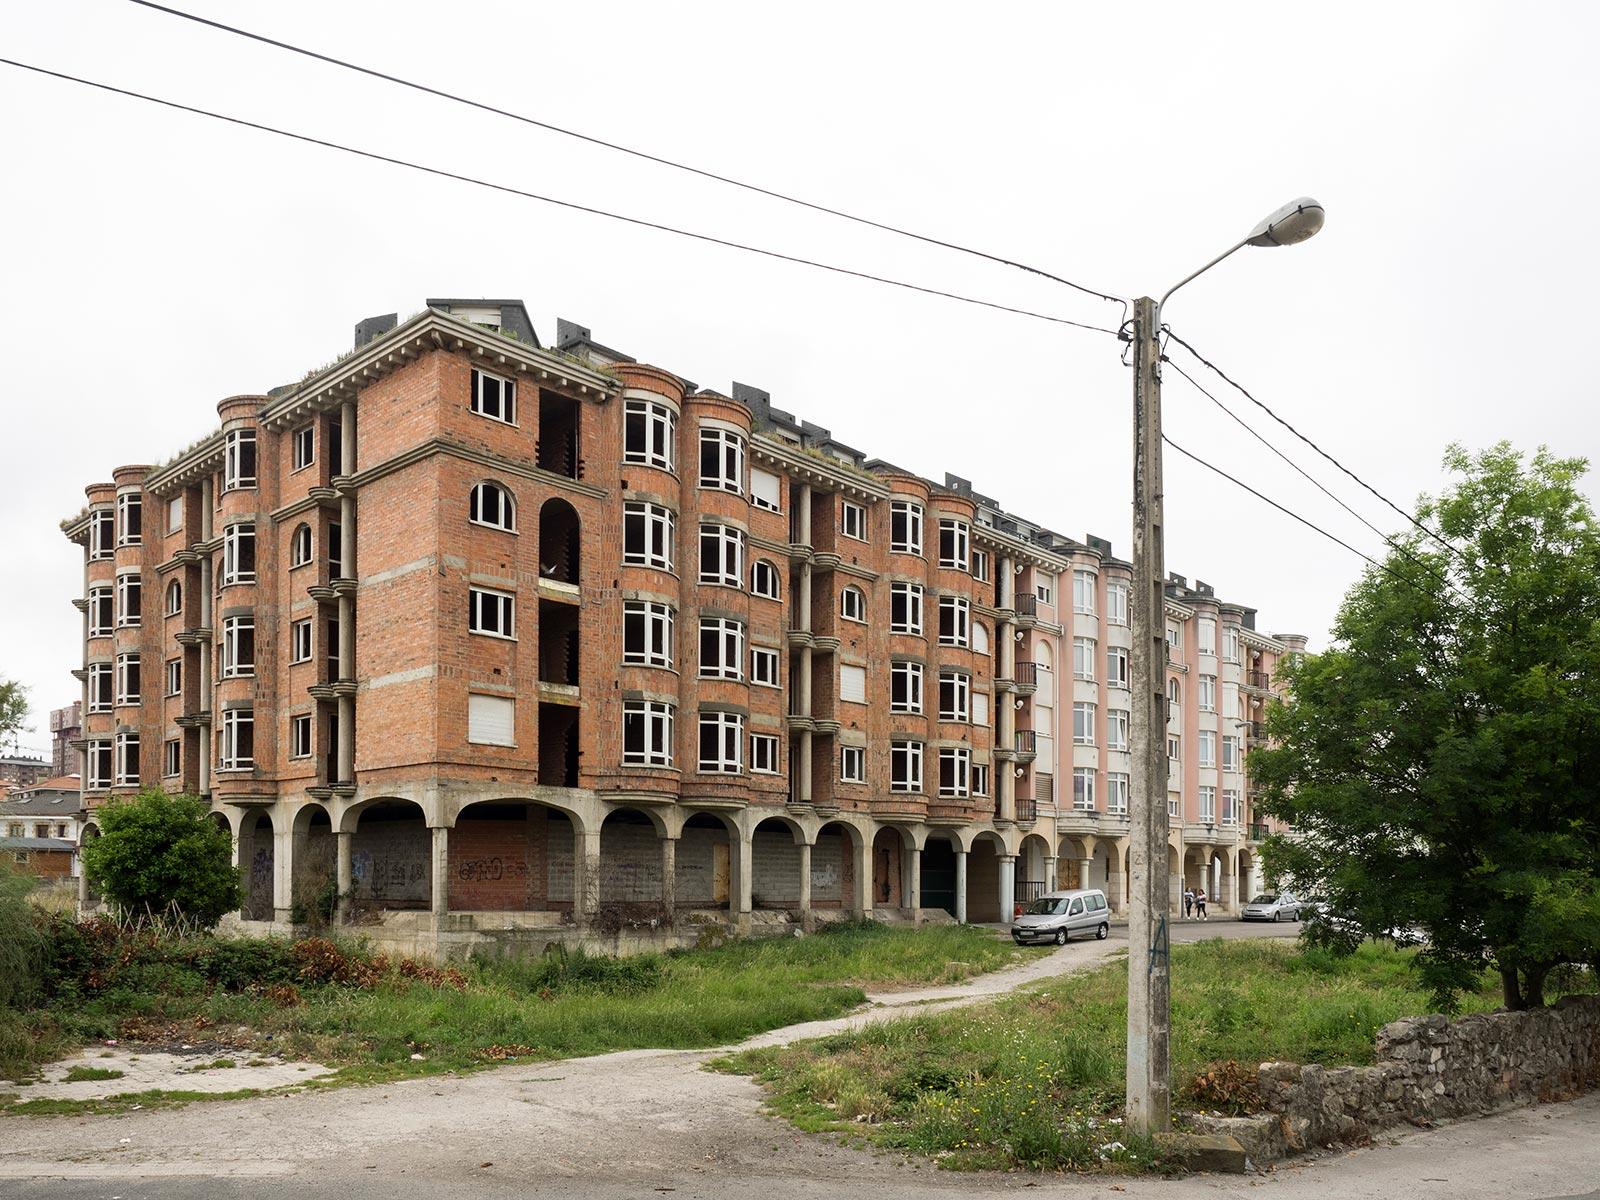 Arquitectures - 10 - BadiaCasanova